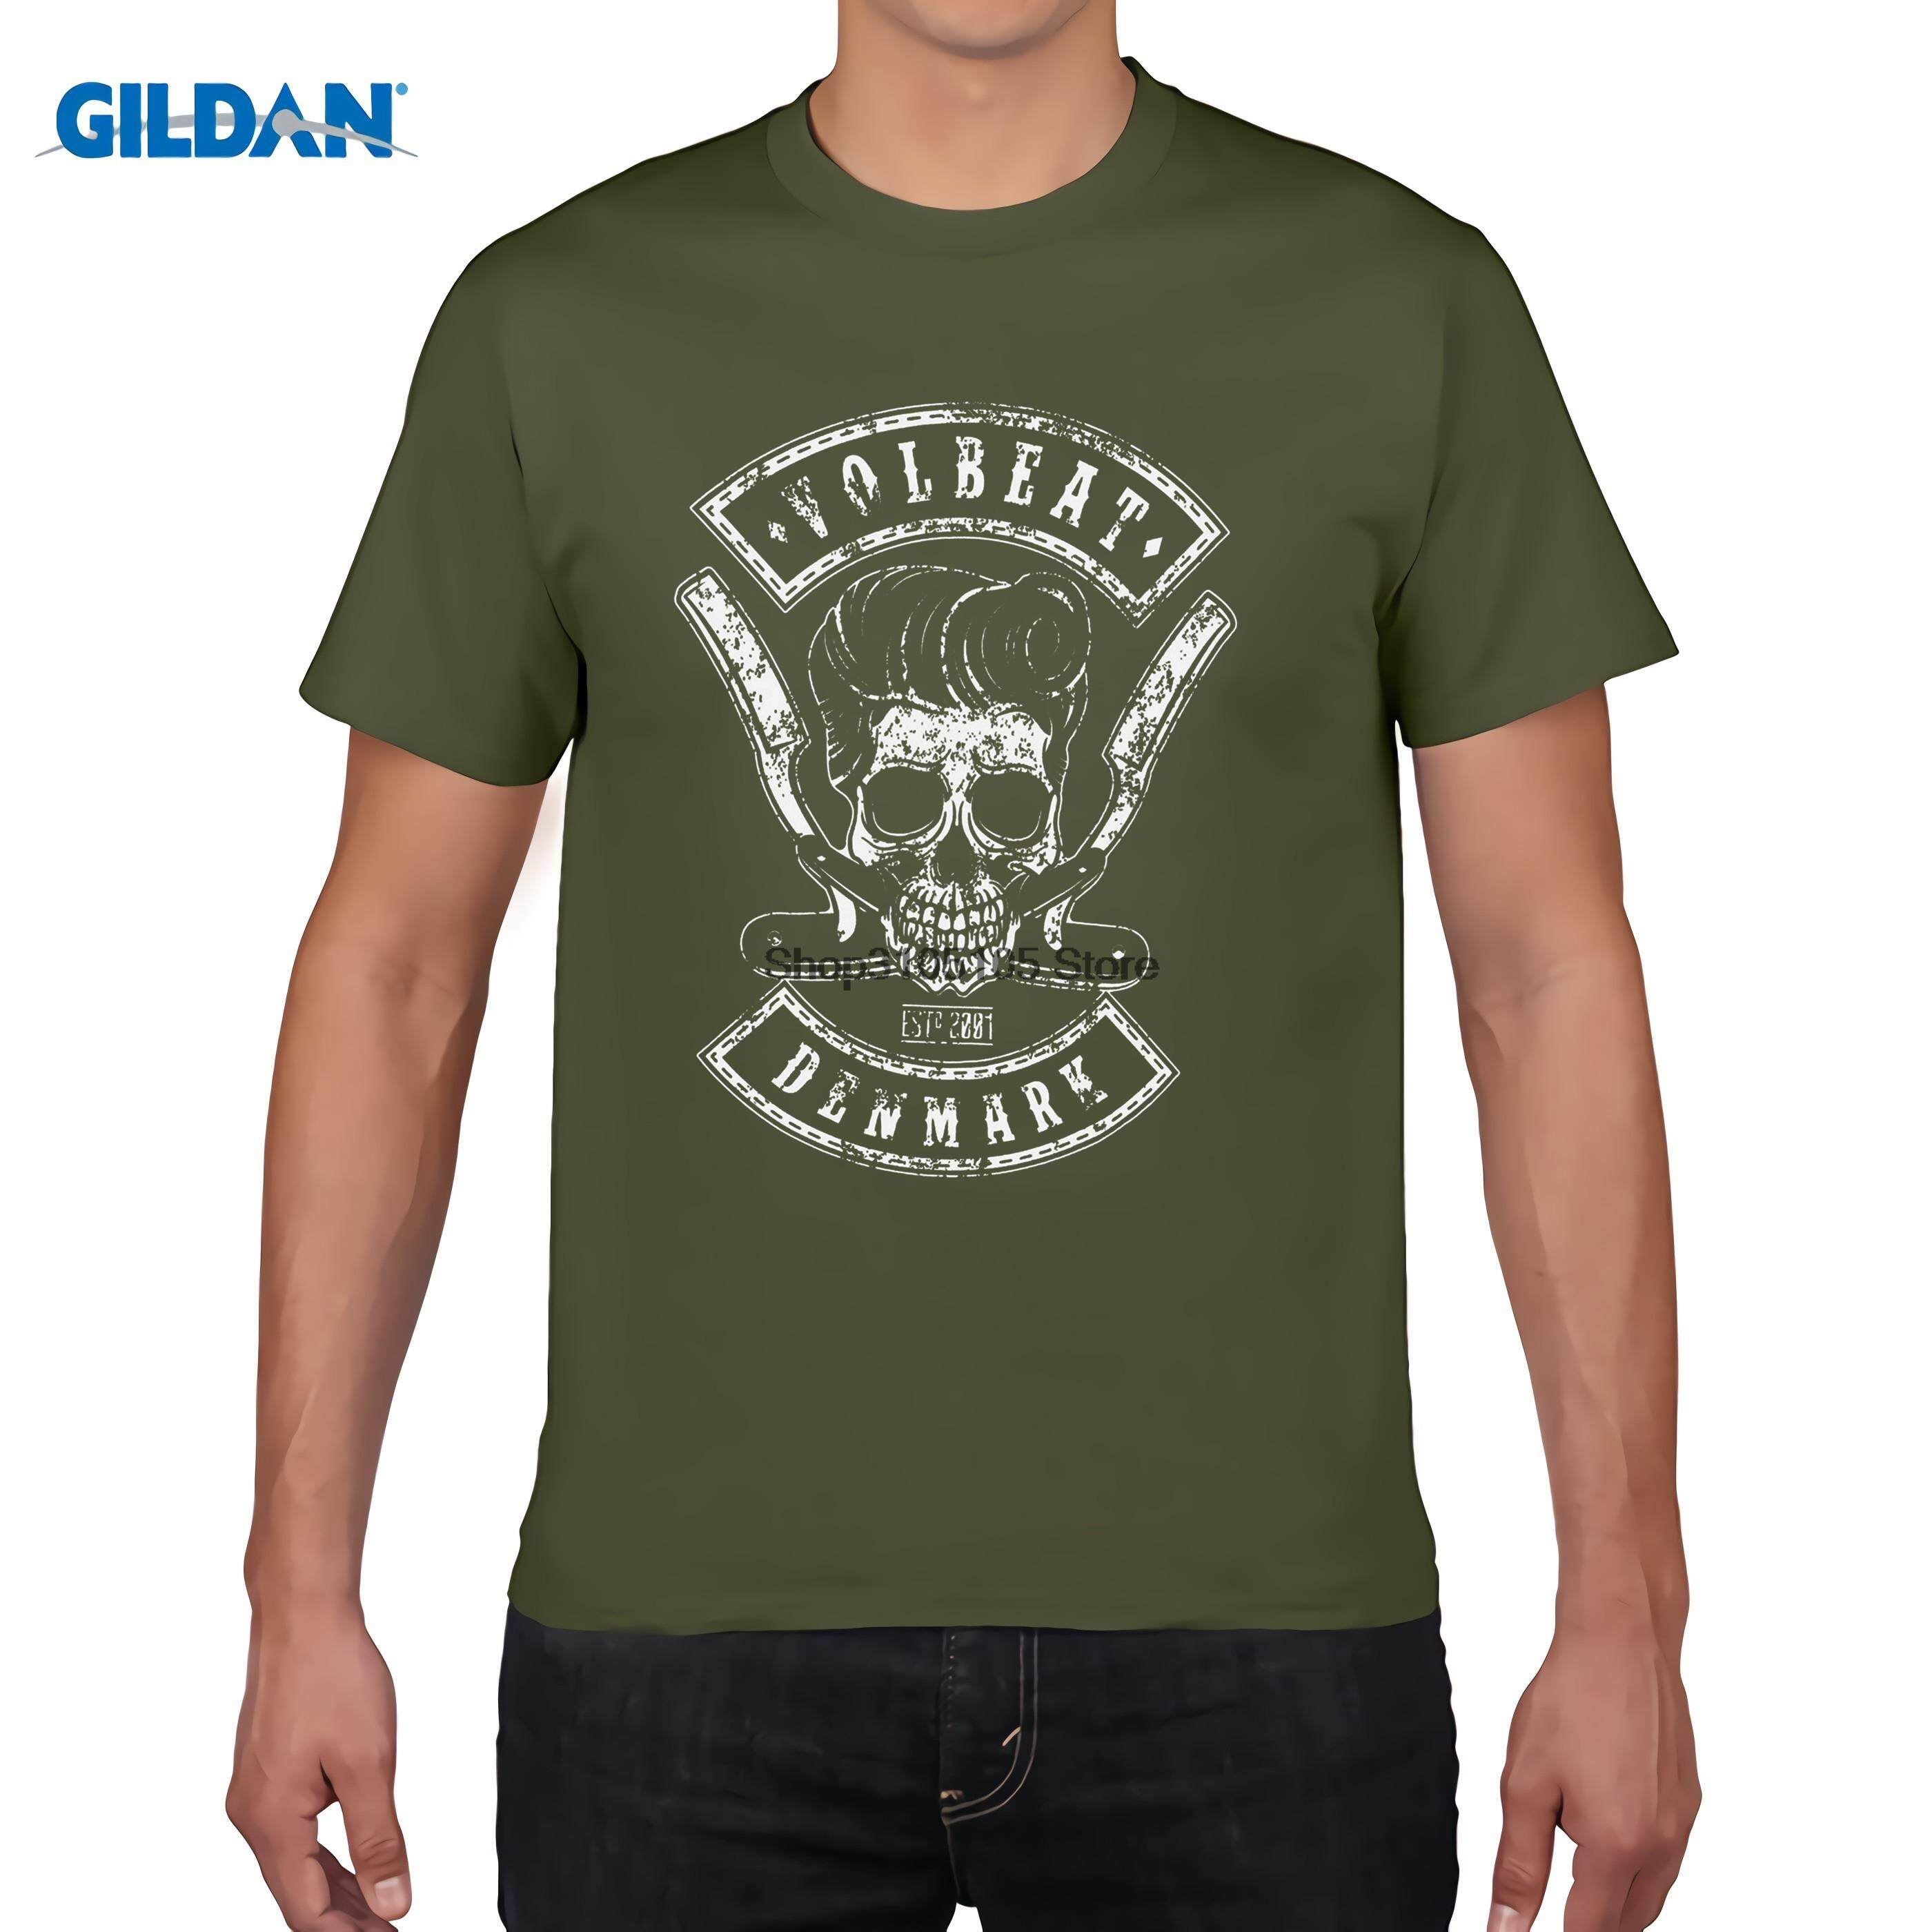 T Shirt Design Price Philippines Summer Cook